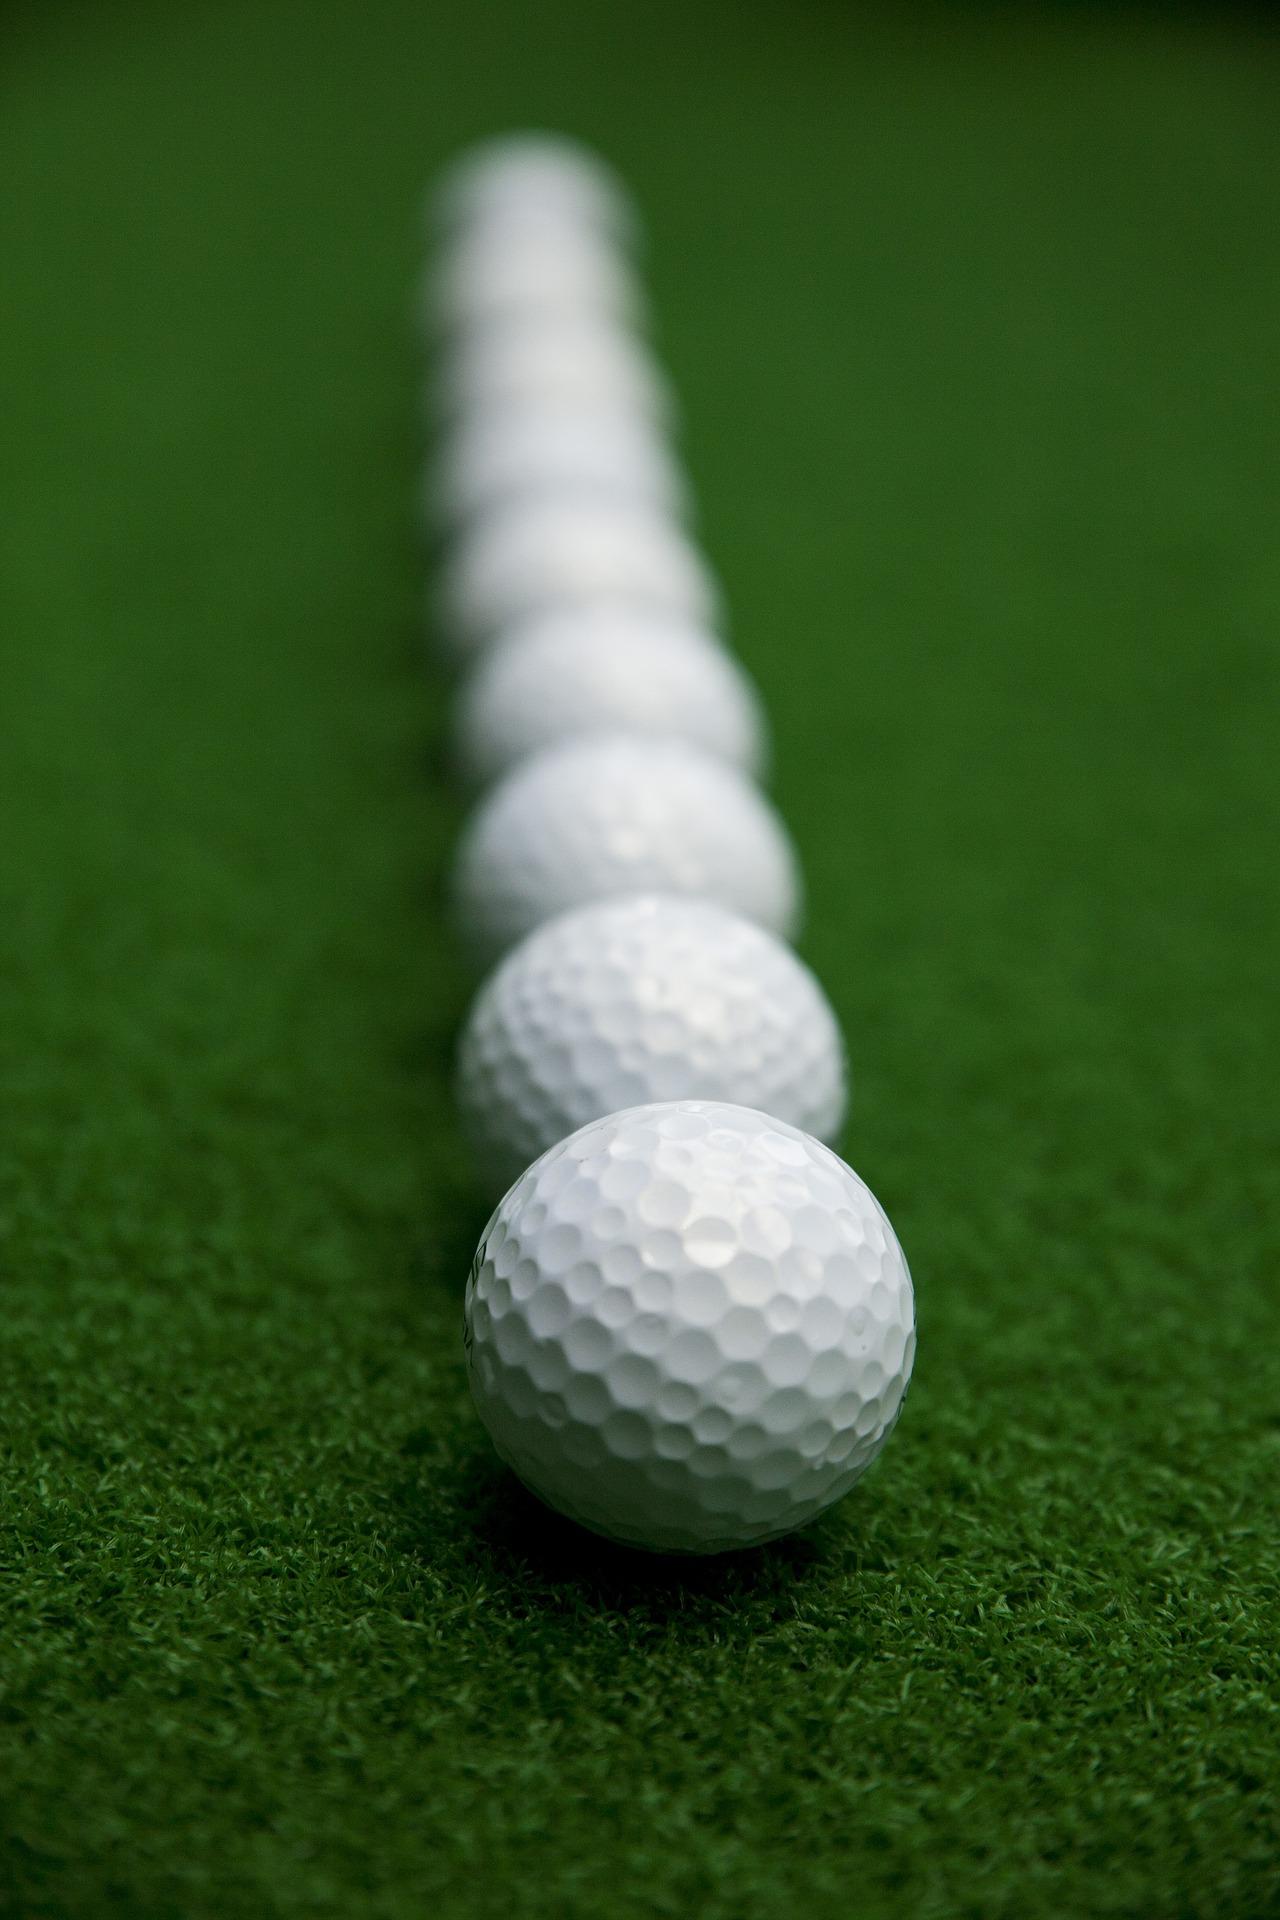 golf-2517685_1920